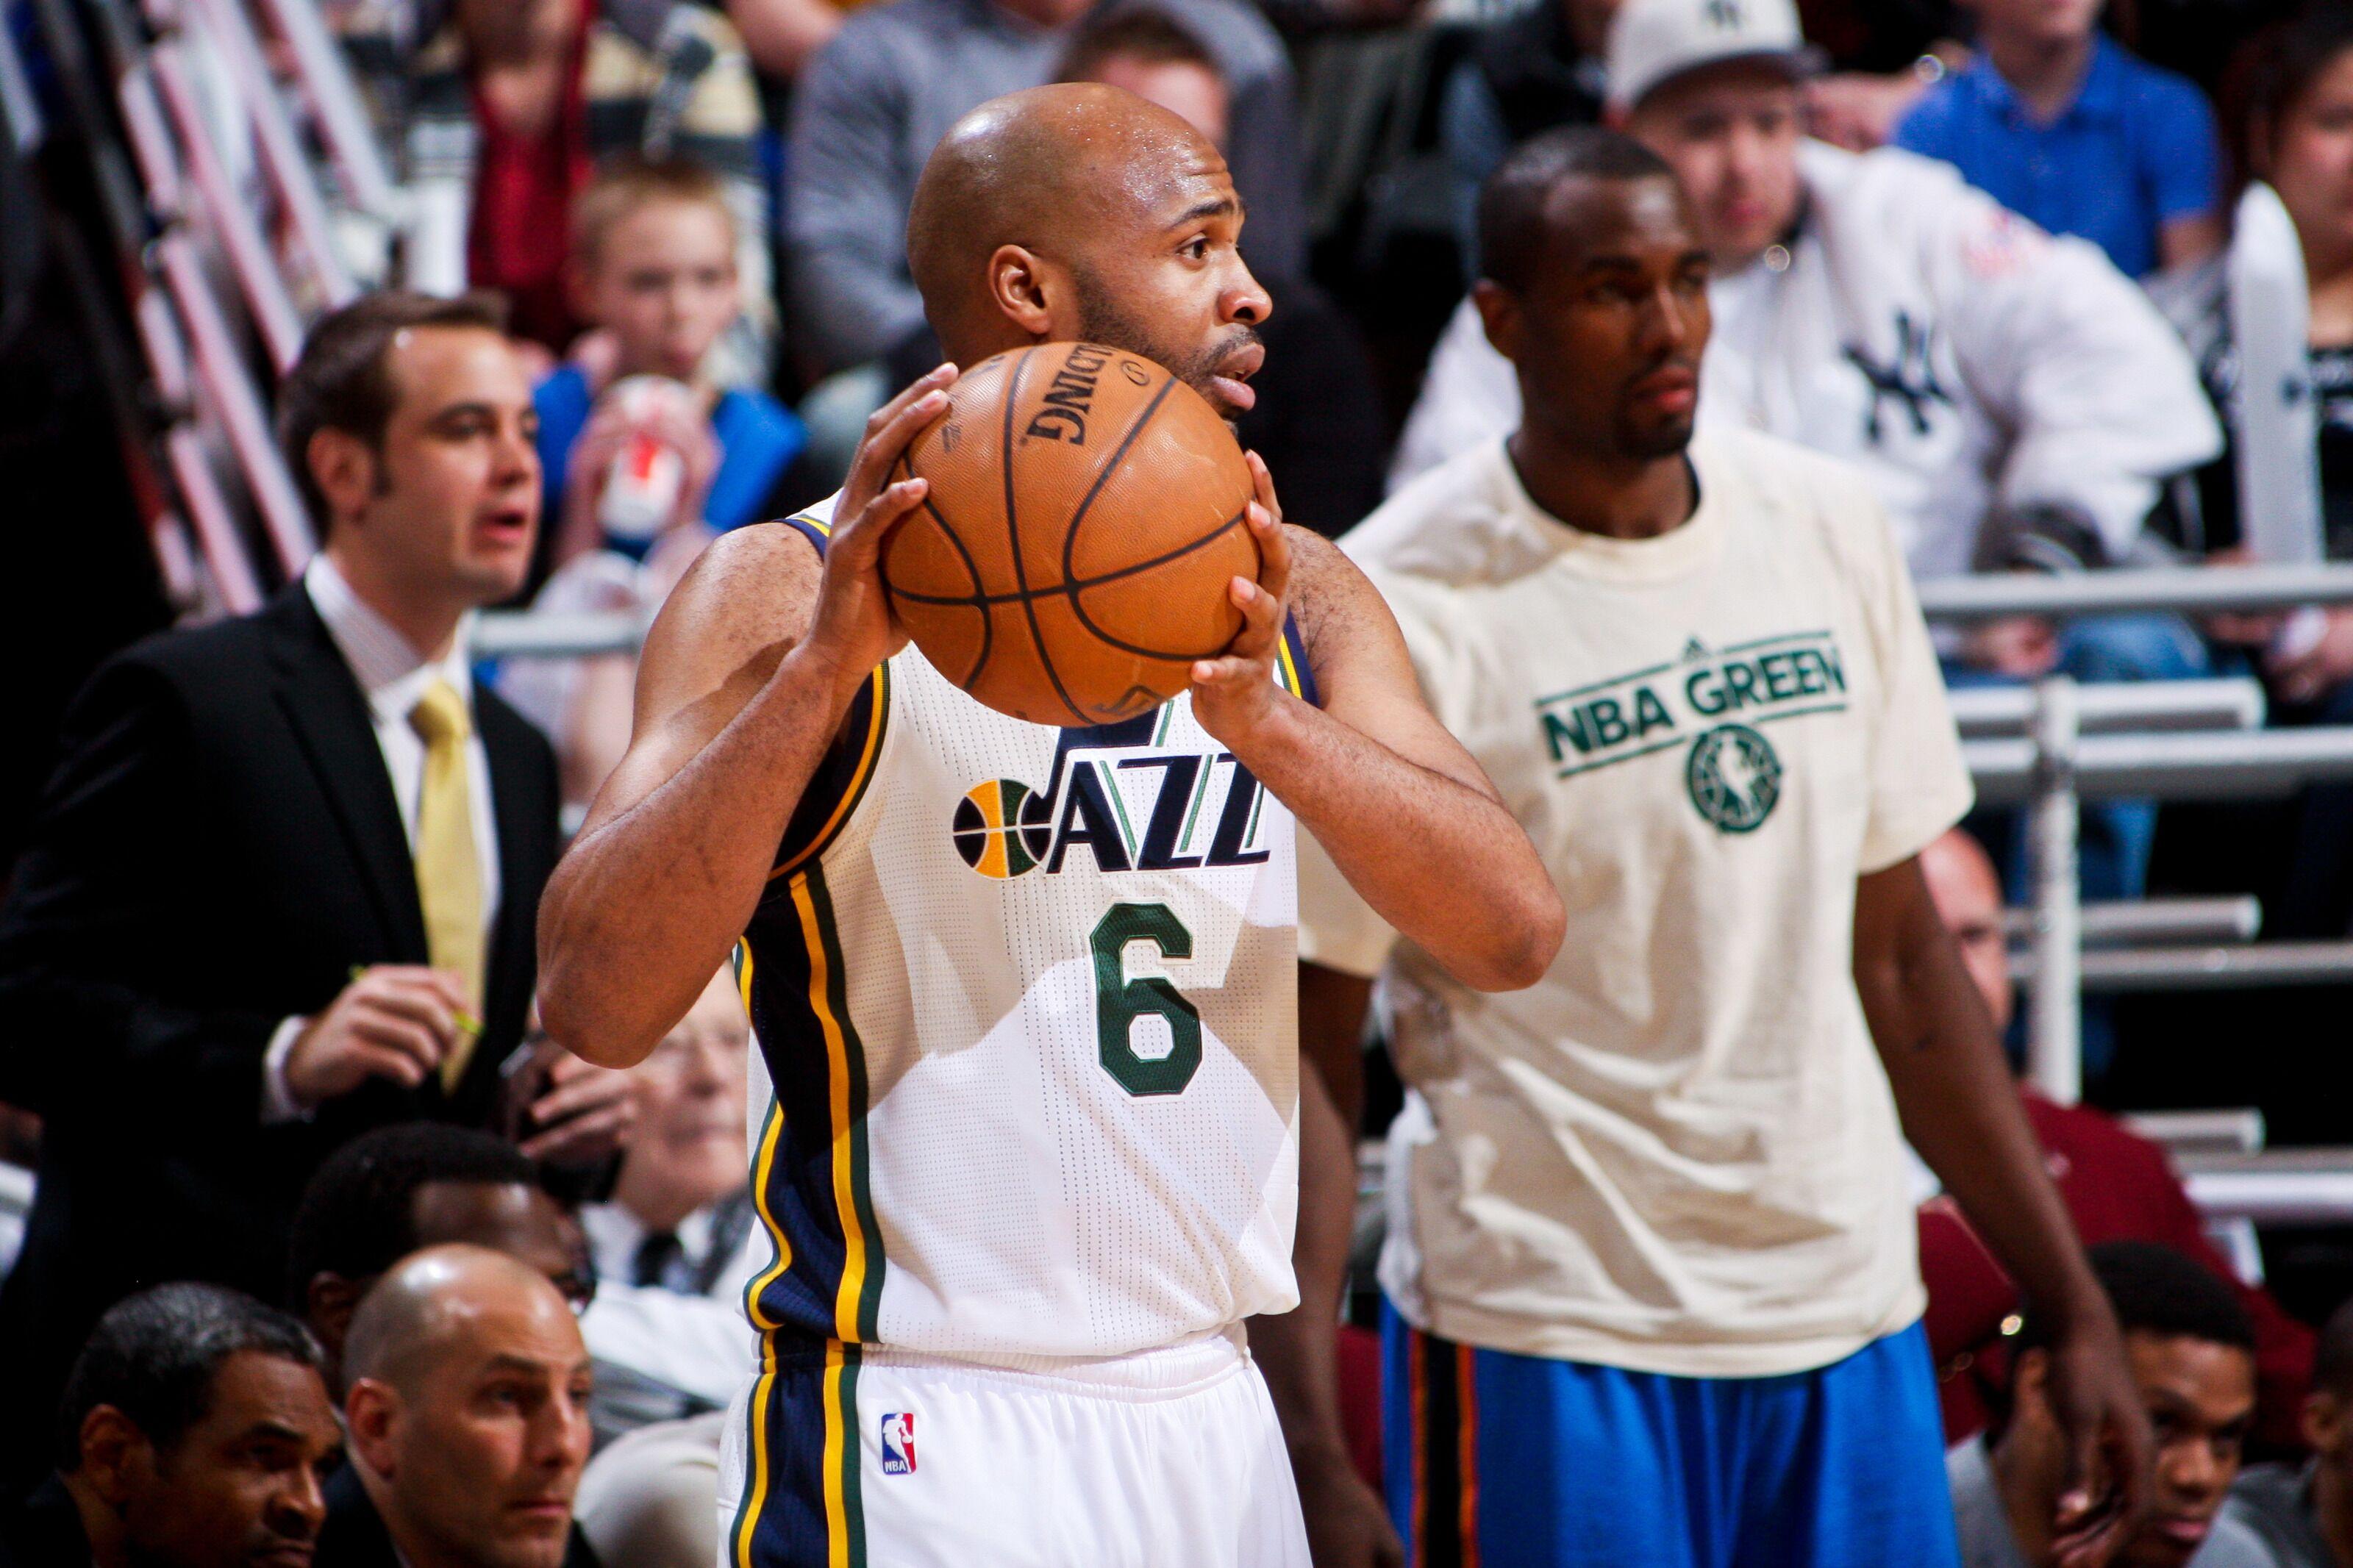 Utah Jazz: Niang, Mitrou-Long, Hornacek and Tinsley return to Iowa St.